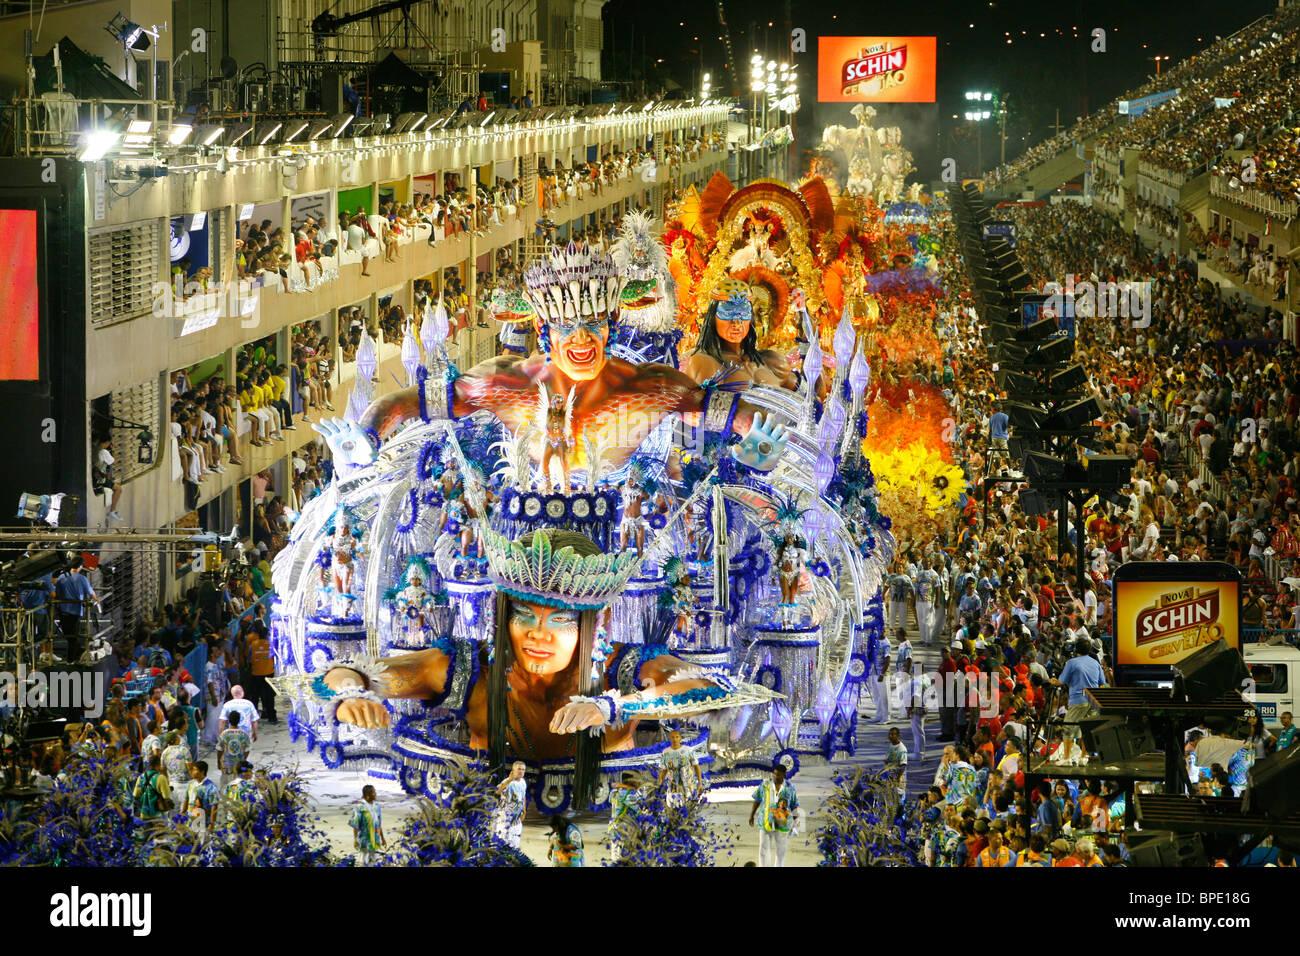 Carnival parade at the Sambodrome, Rio de Janeiro, Brazil. - Stock Image